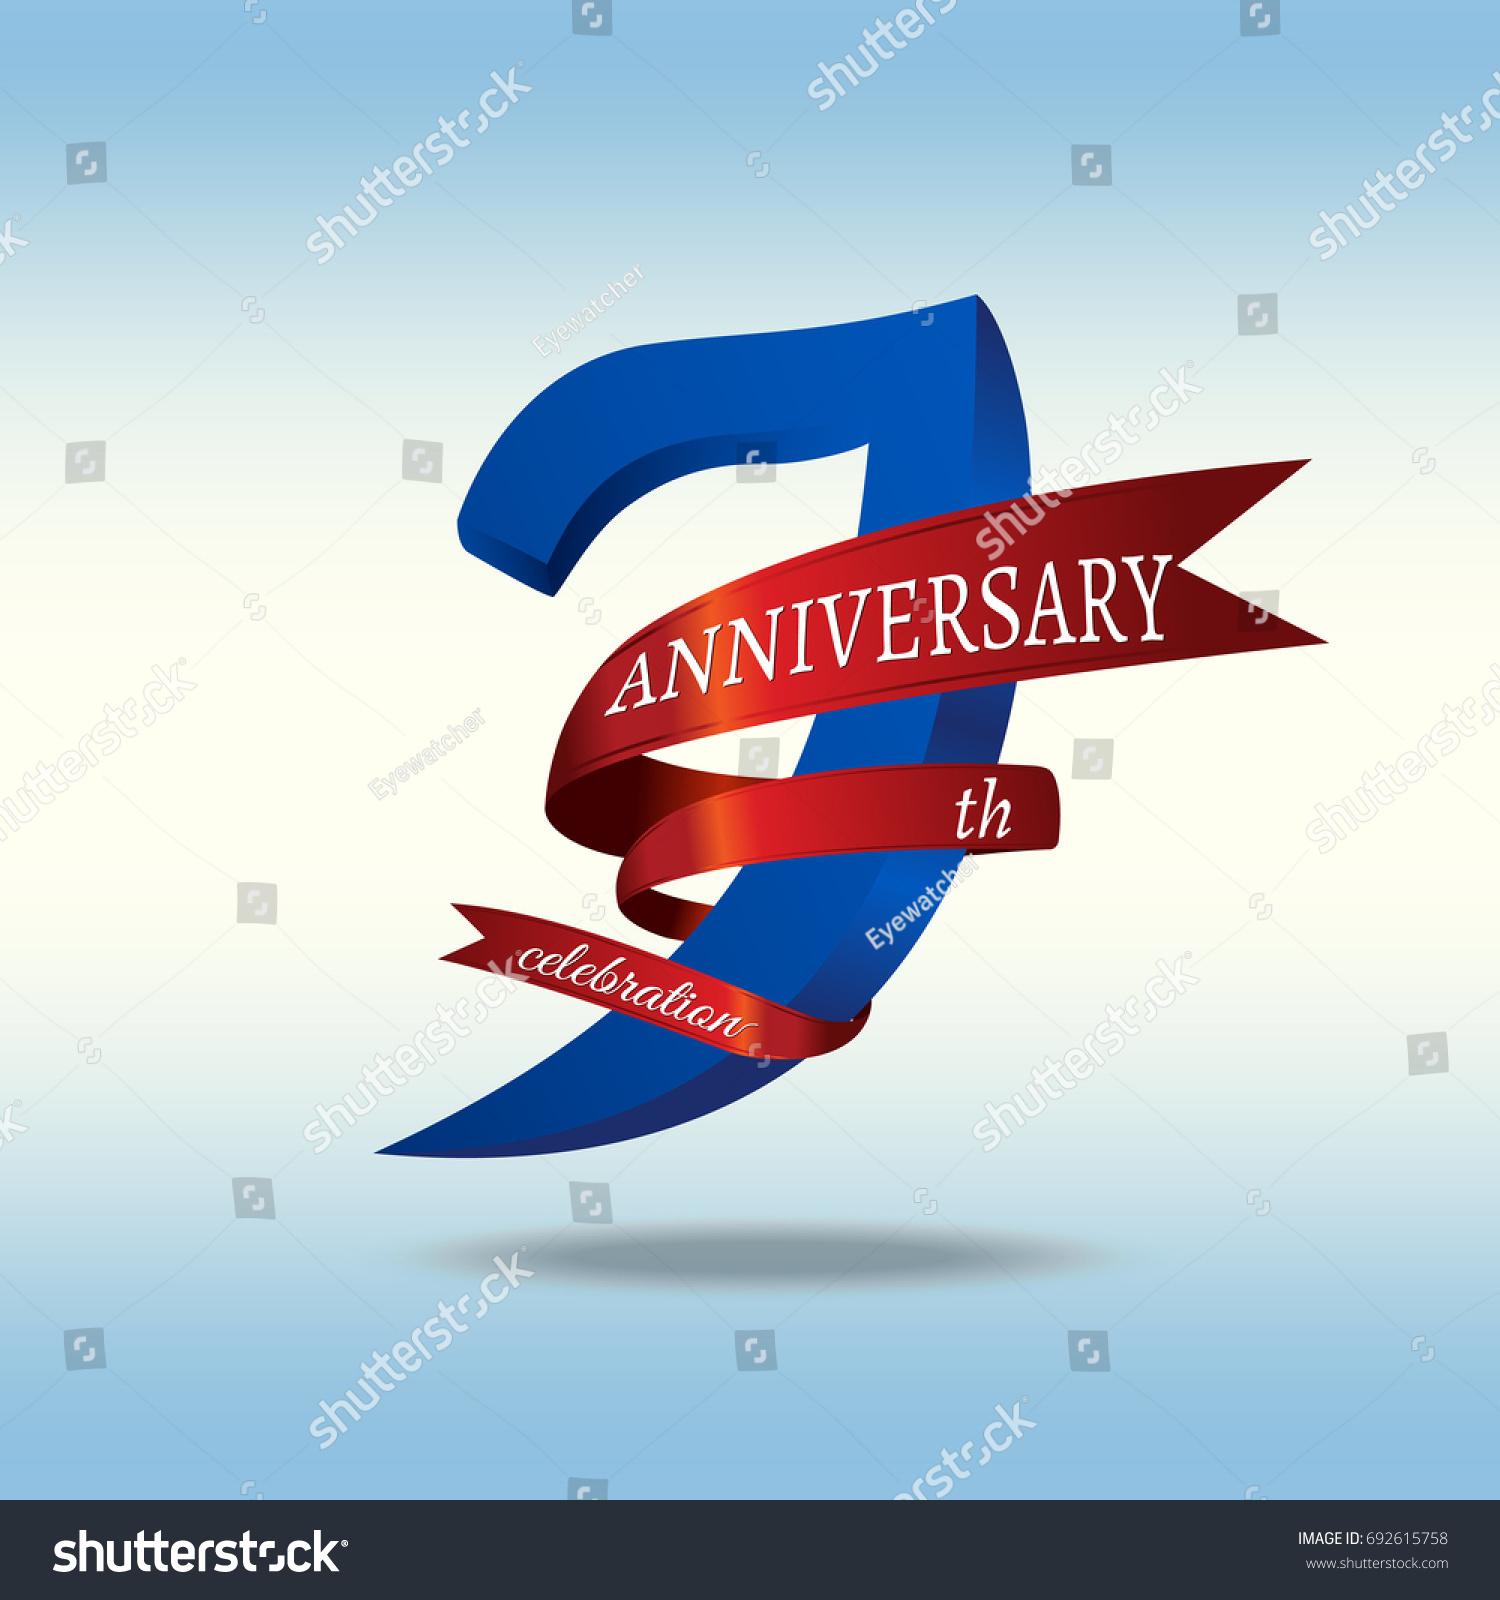 7th anniversary symbol vector stock vector 692615758 shutterstock 7th anniversary symbol vector buycottarizona